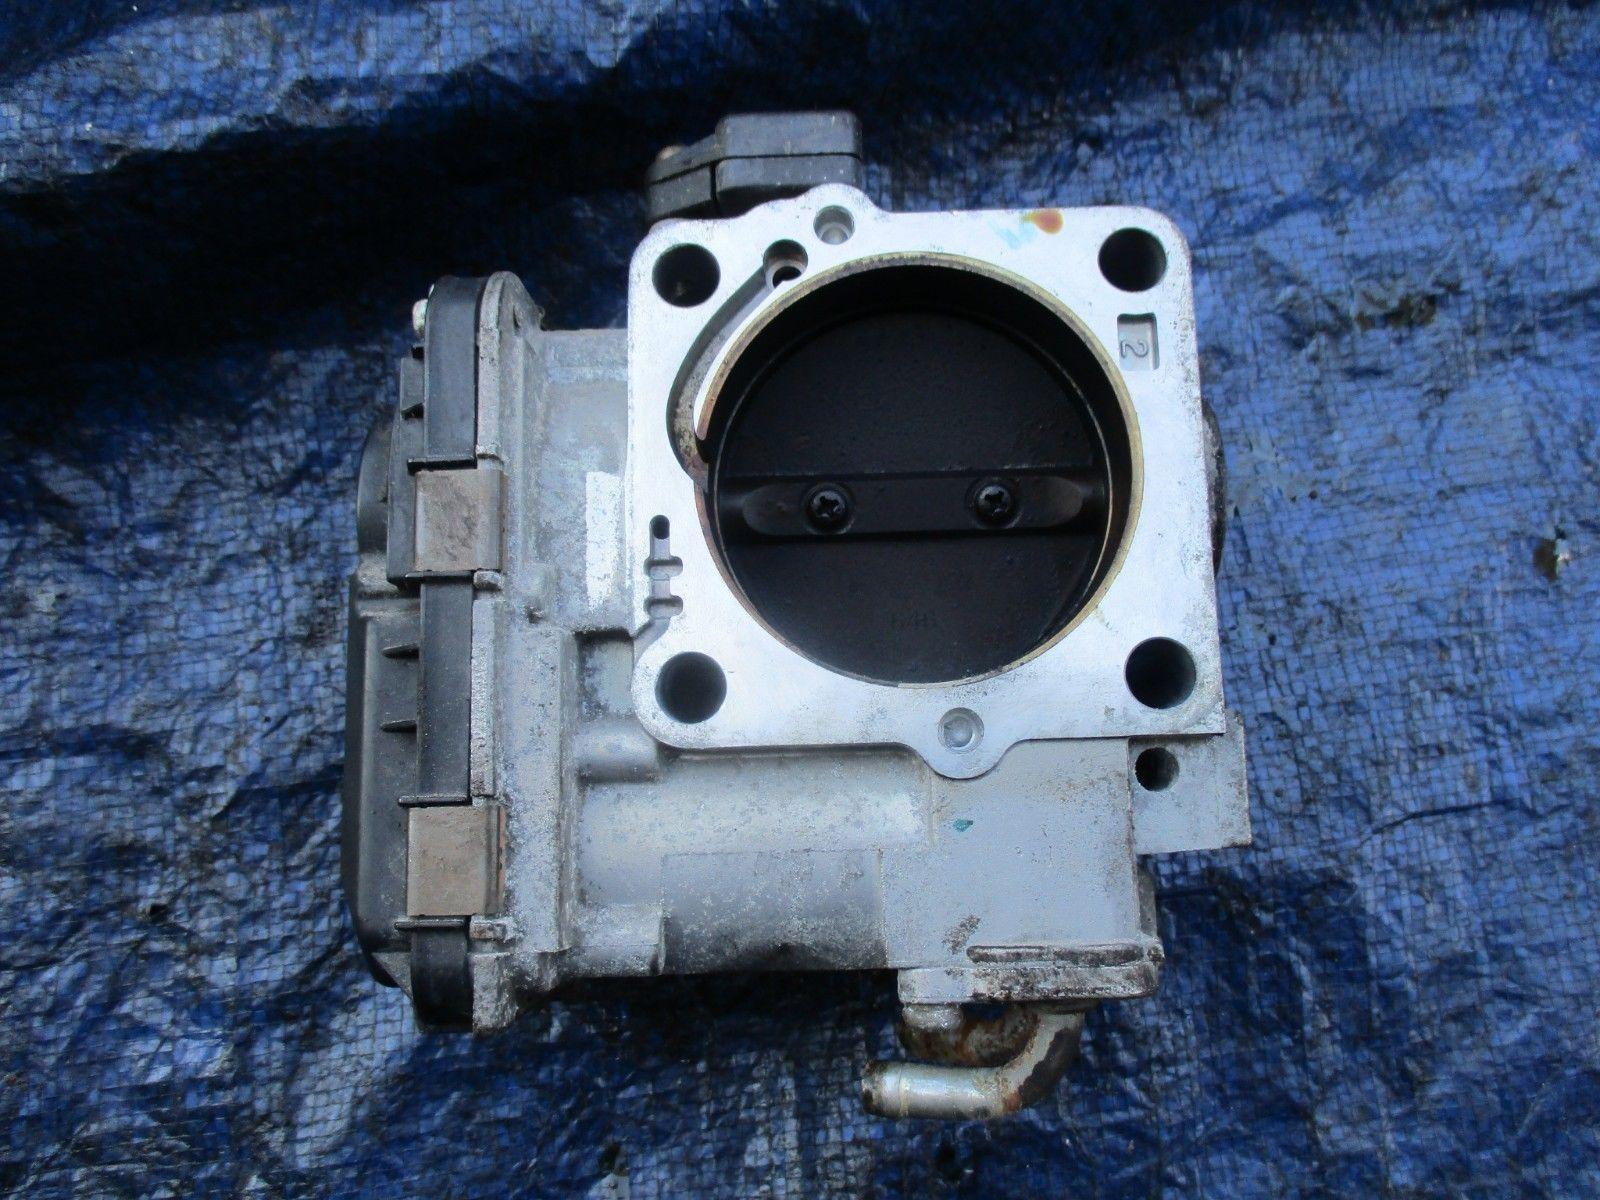 04-06 Acura TL J32A3 VTEC throttle body assembly engine motor OEM RDA V6